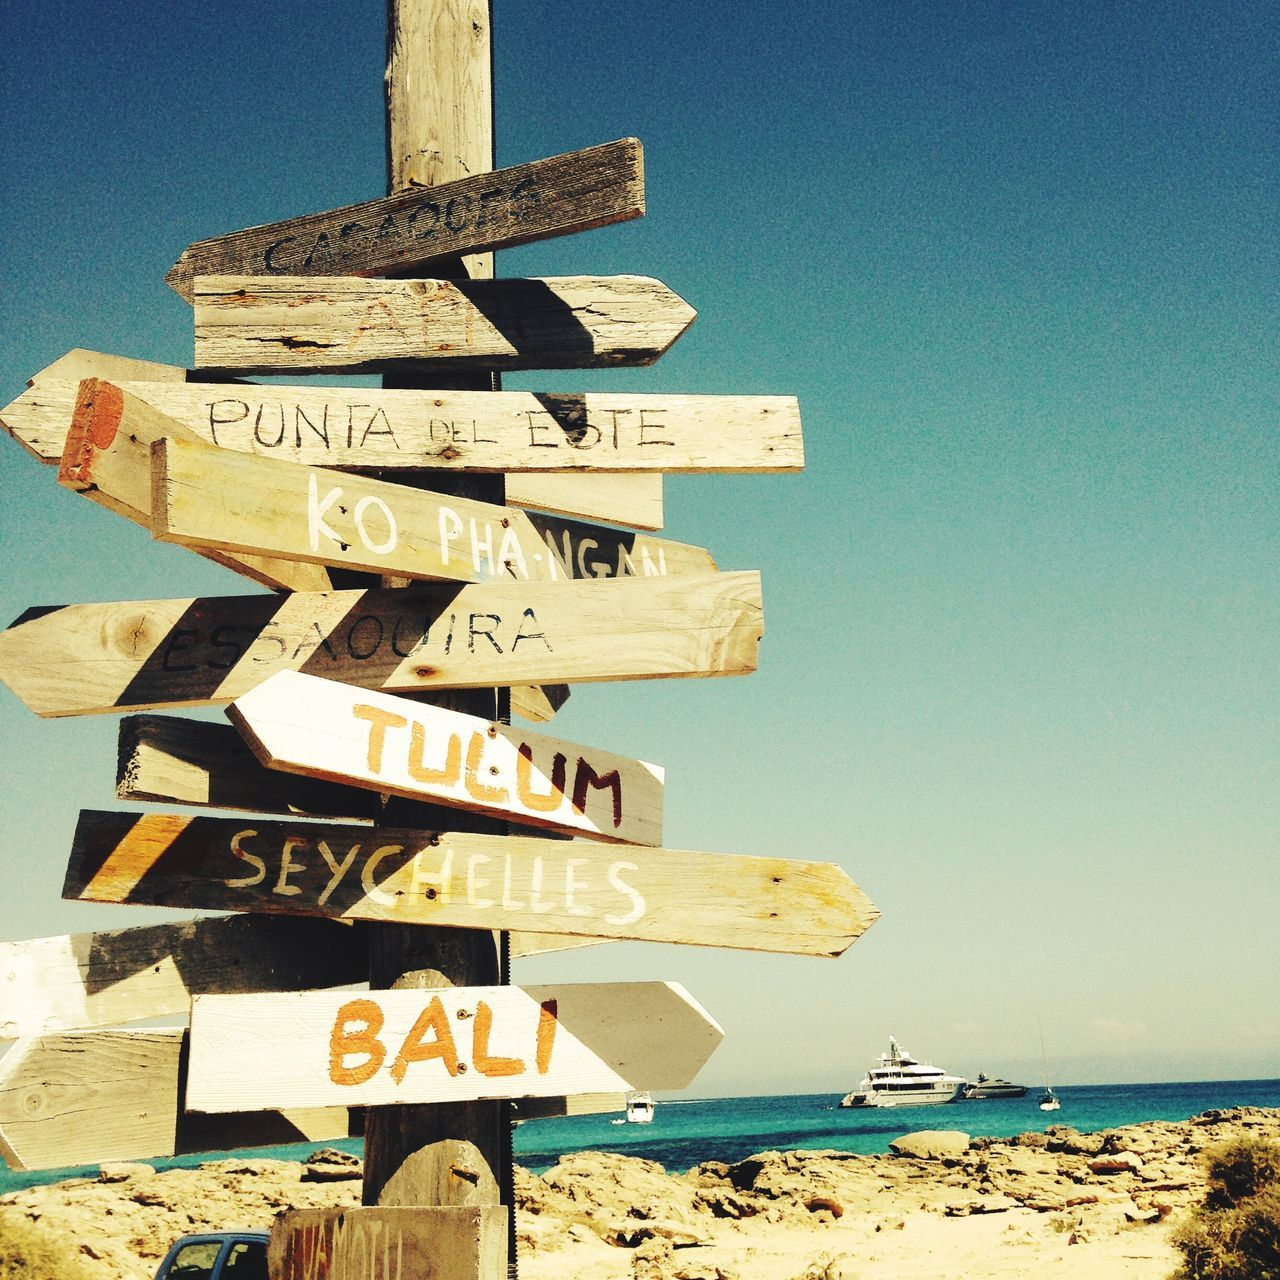 Formentera Island Formentera island lover First Eyeem Photo Bali lost and found Tulum beach